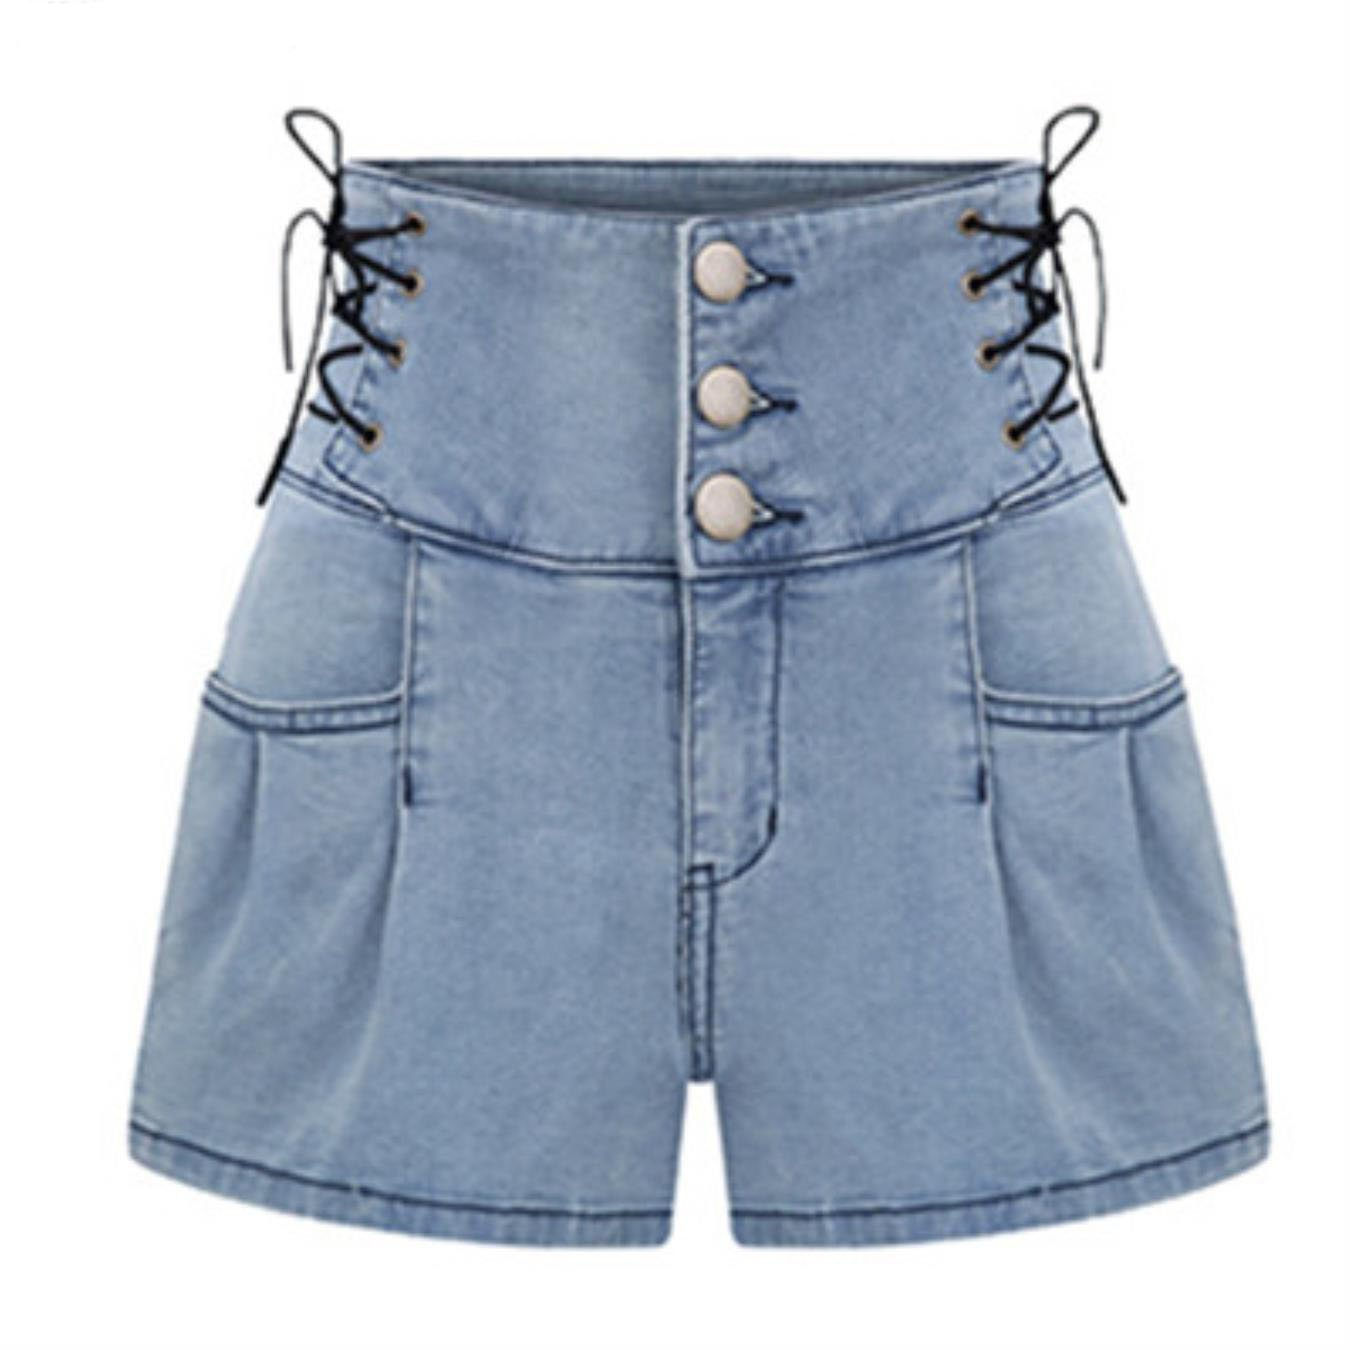 uLovjkjW Womens Retro High Waist Lace up Bandage Slim Fit Denim Shorts